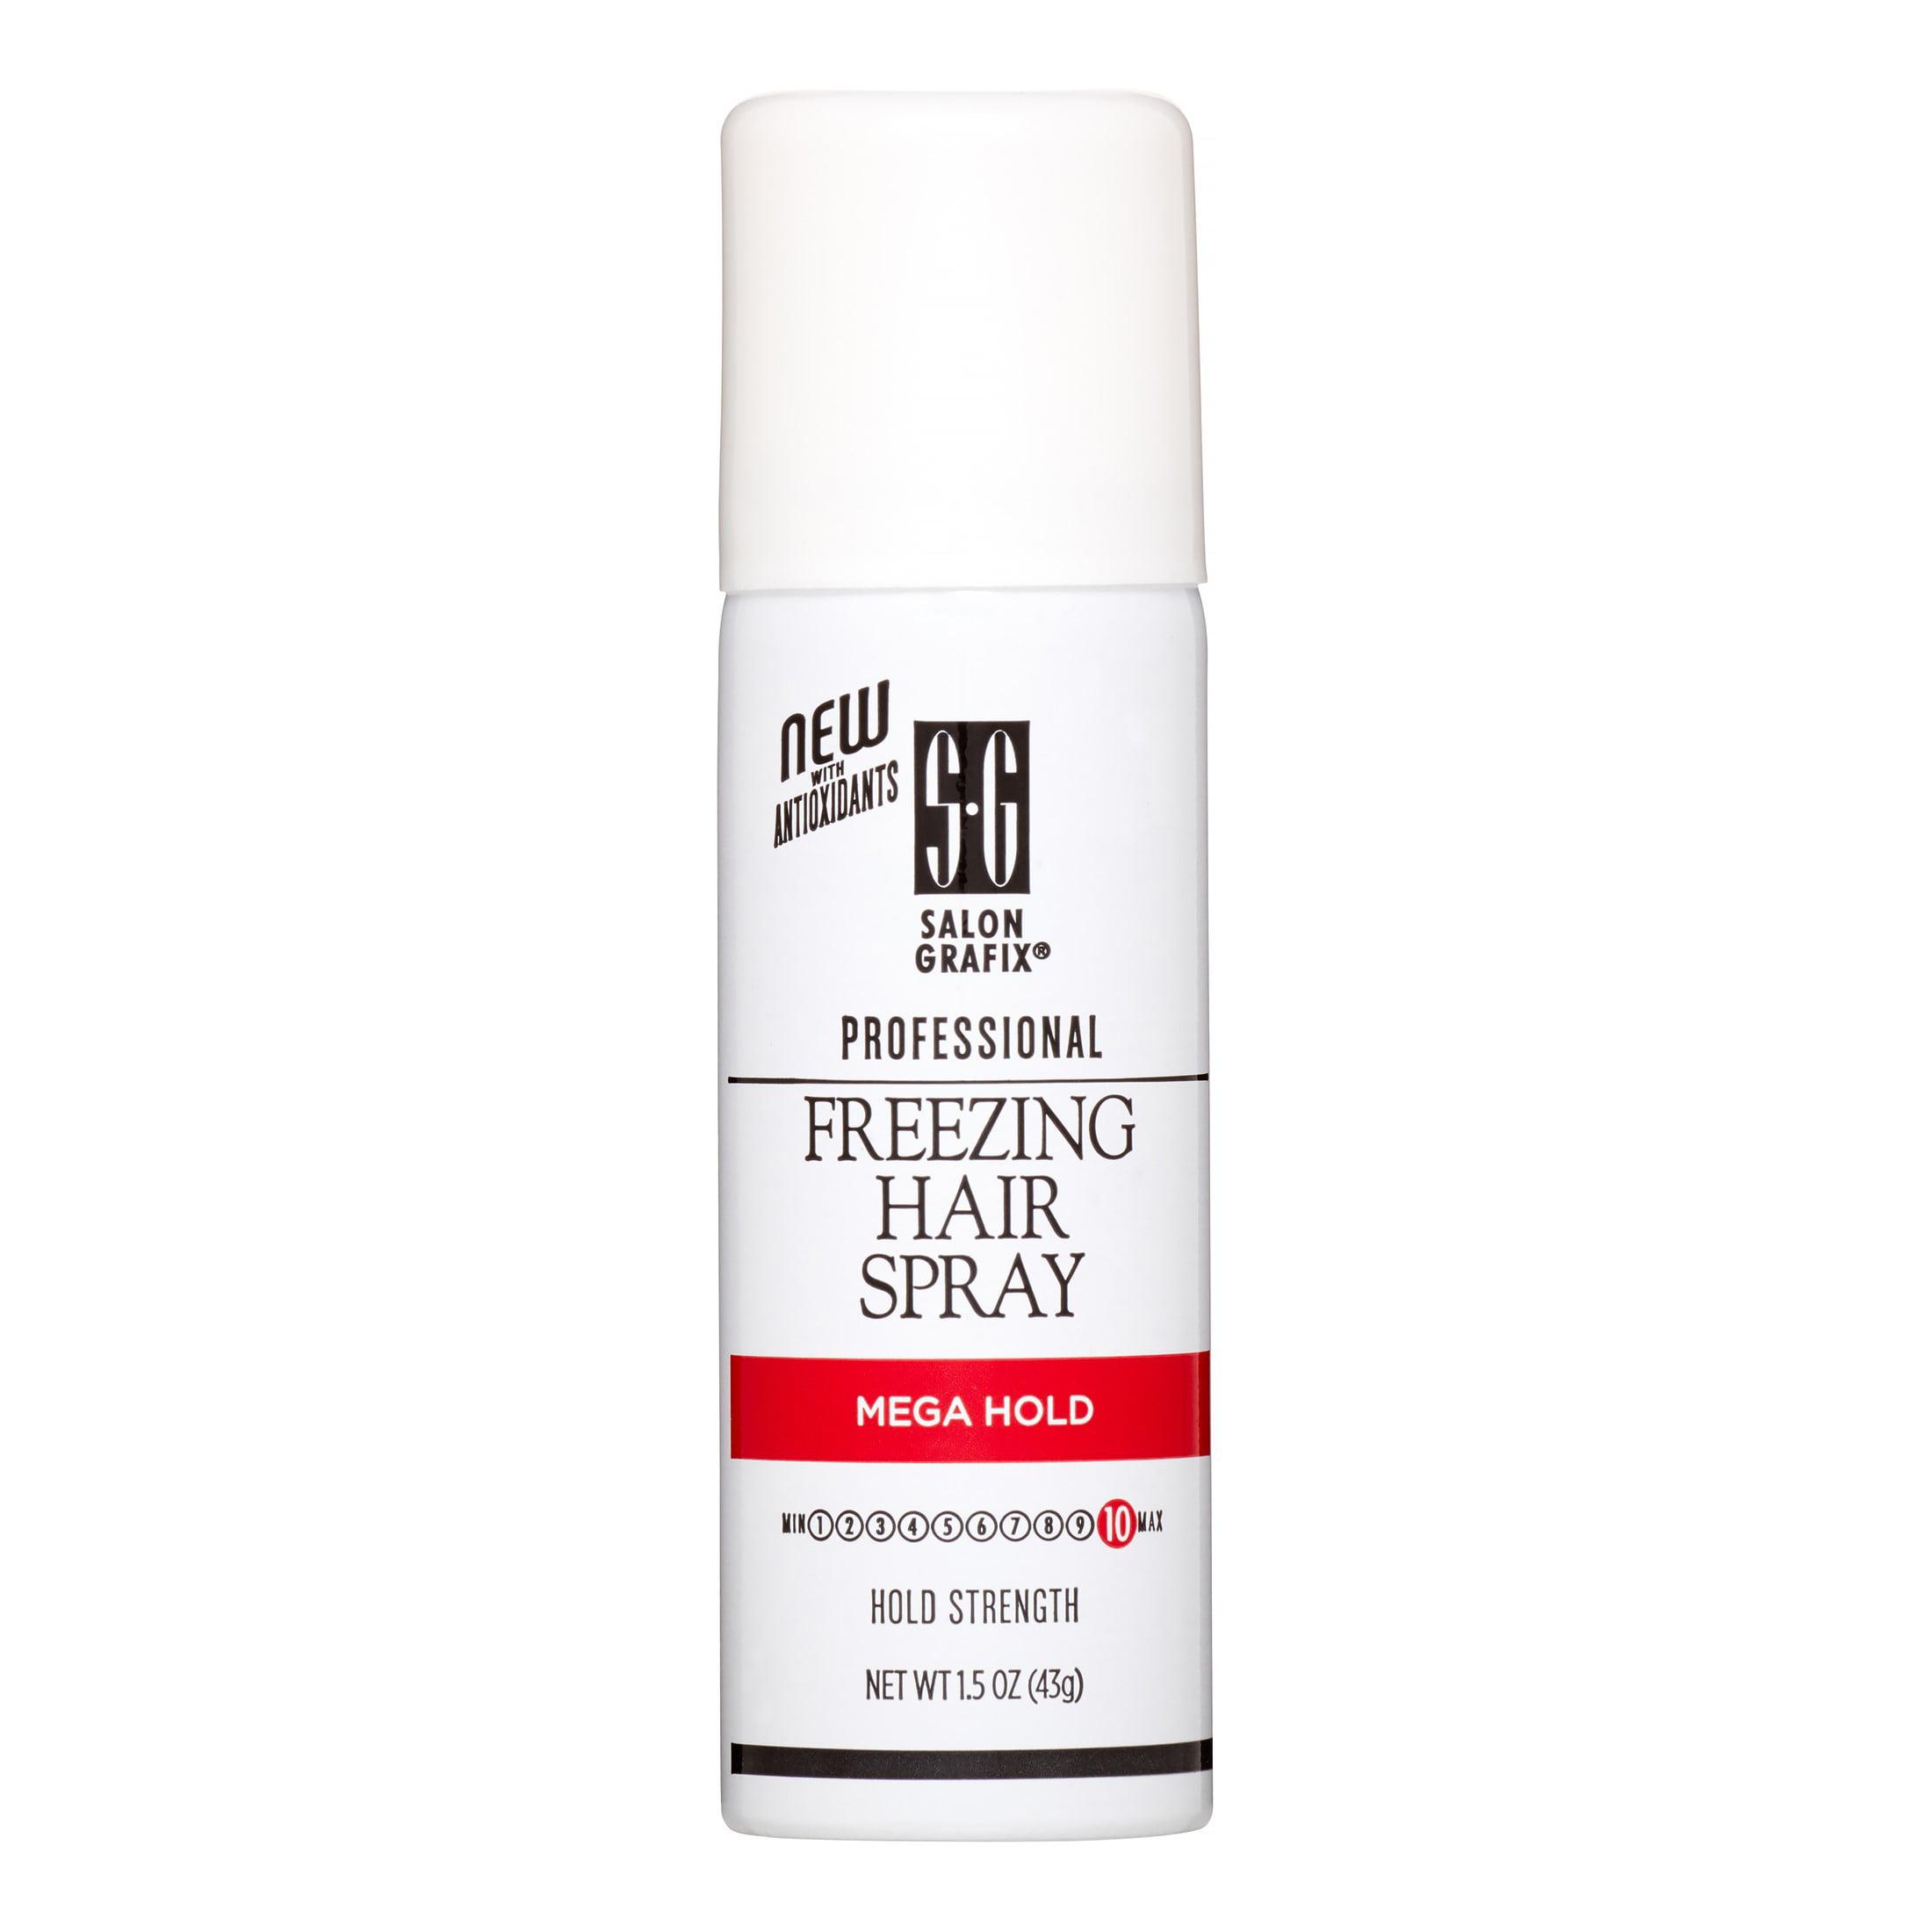 Salon Grafix Freezing Hair Spray, Mega Hold, 1.5 Oz